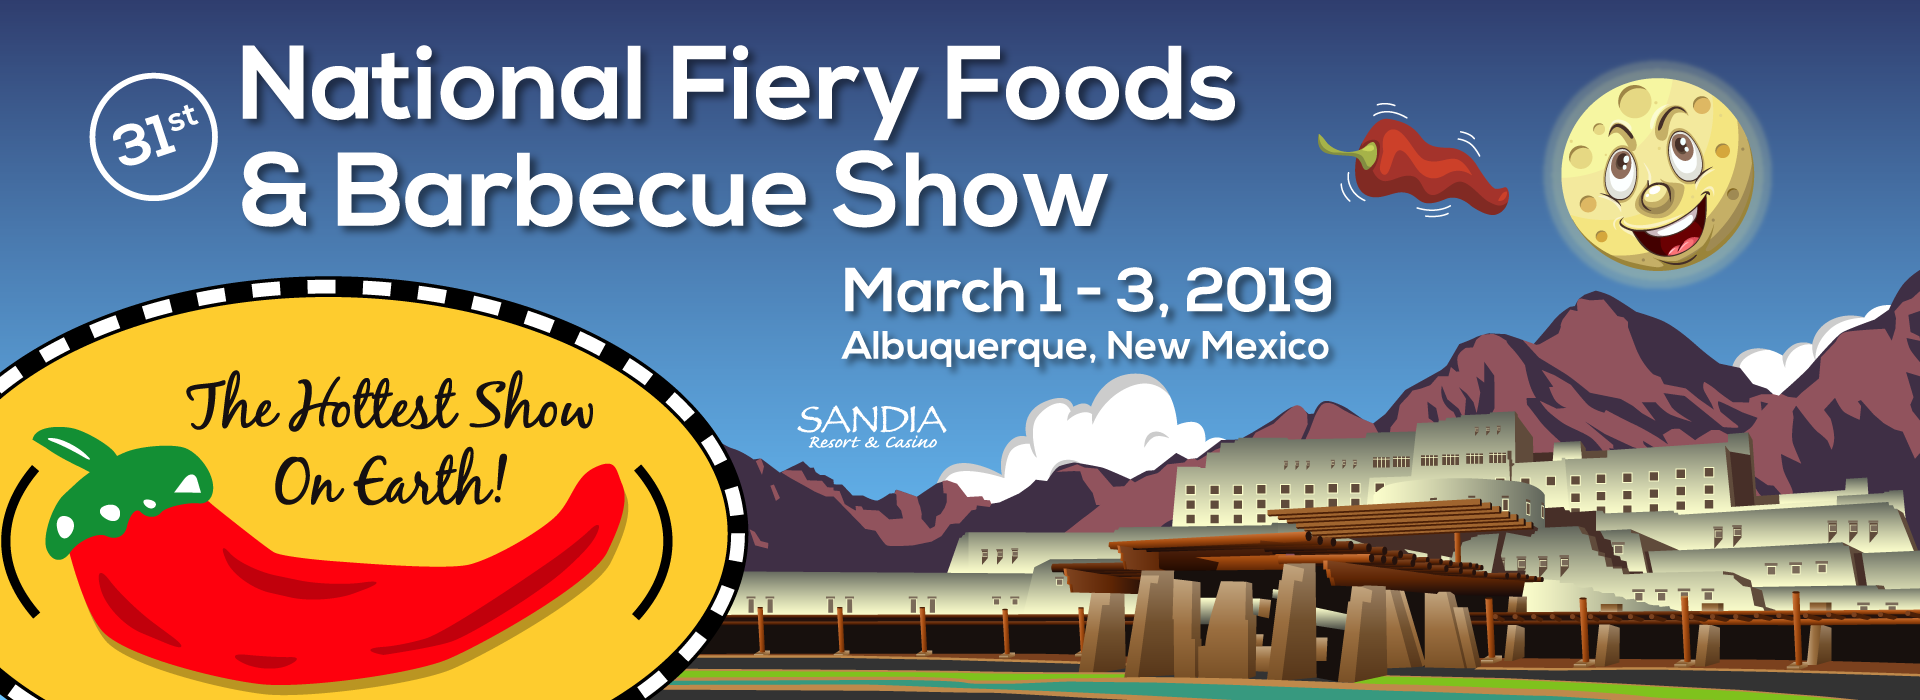 fiery-food-show-logo-2019.png